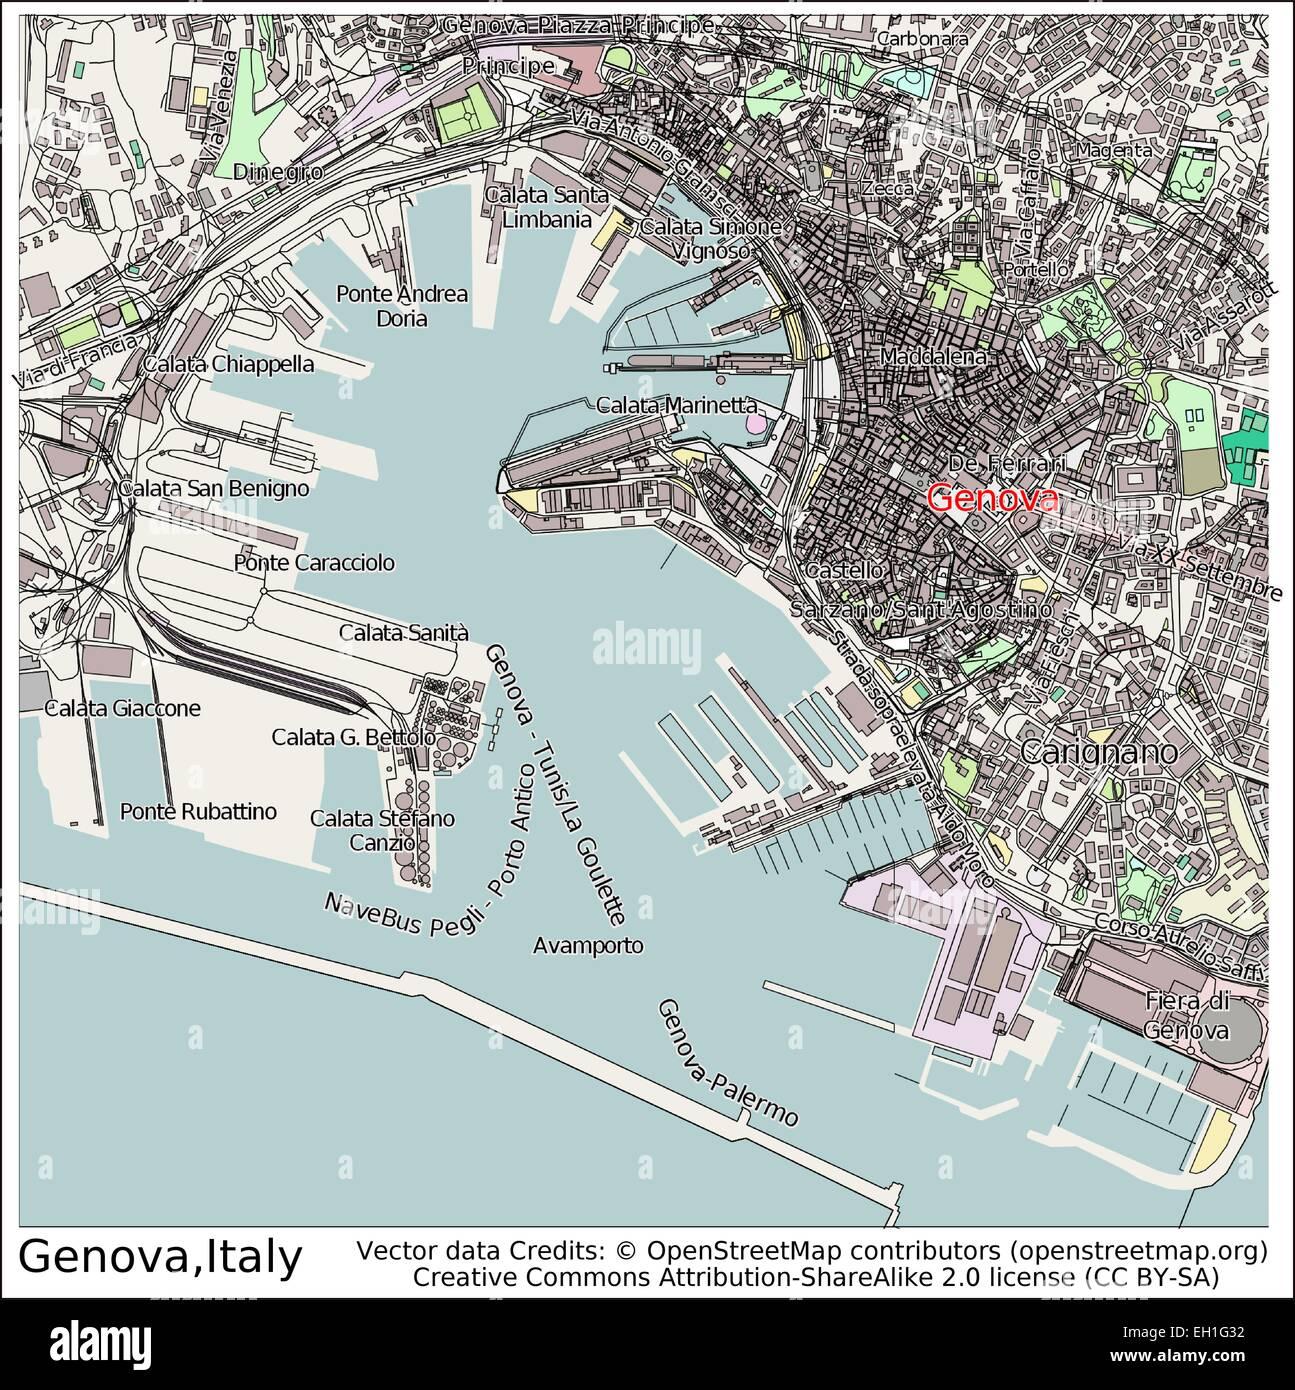 Genoa Italy city map Stock Vector Art Illustration Vector Image